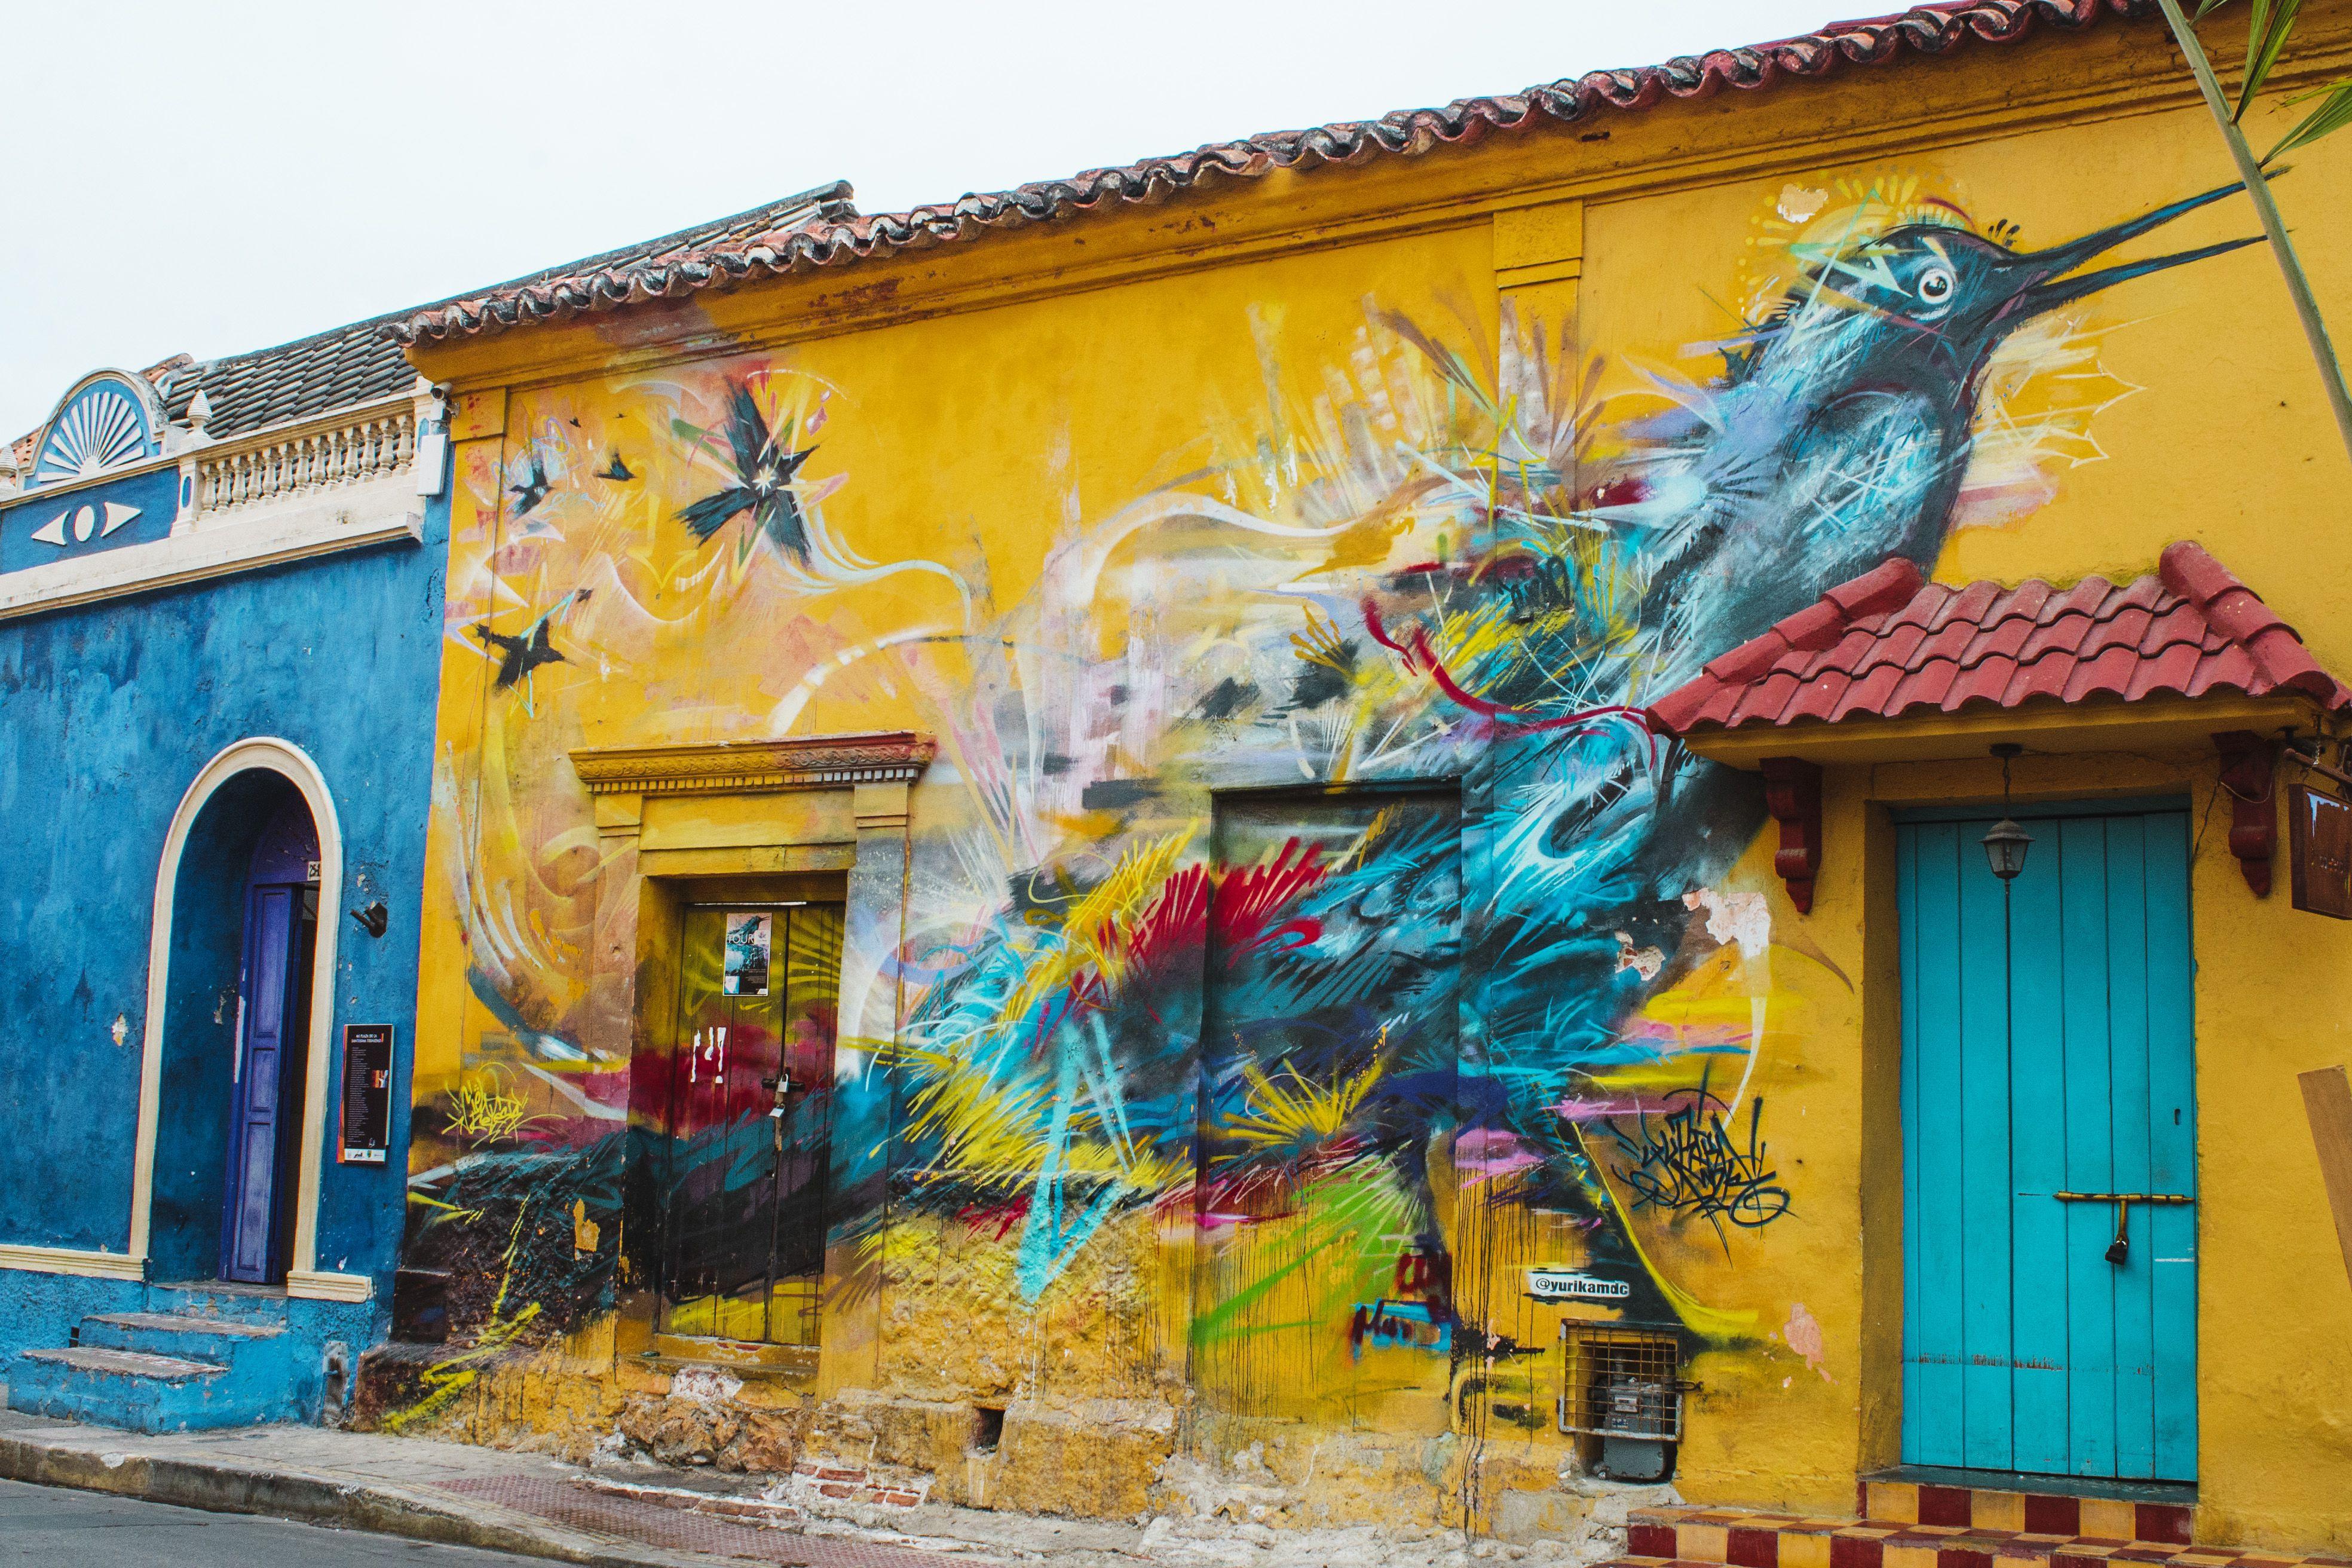 A street art mural in Getsemani